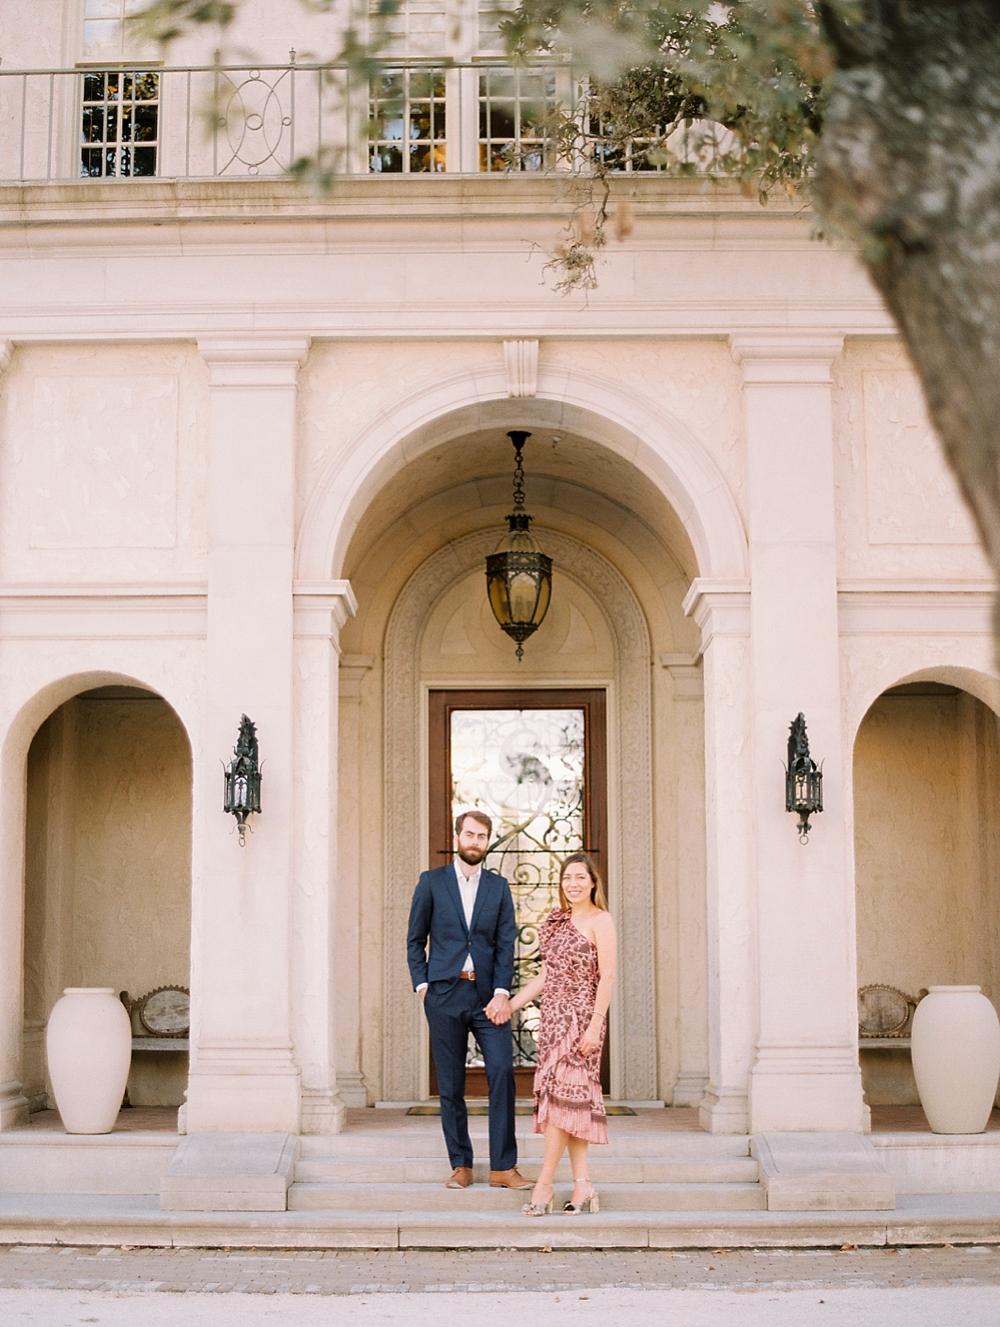 kristin-la-voie-photography-Austin-Wedding-Photographer-laguna-gloria-commodore-perry-estate-engagement-27